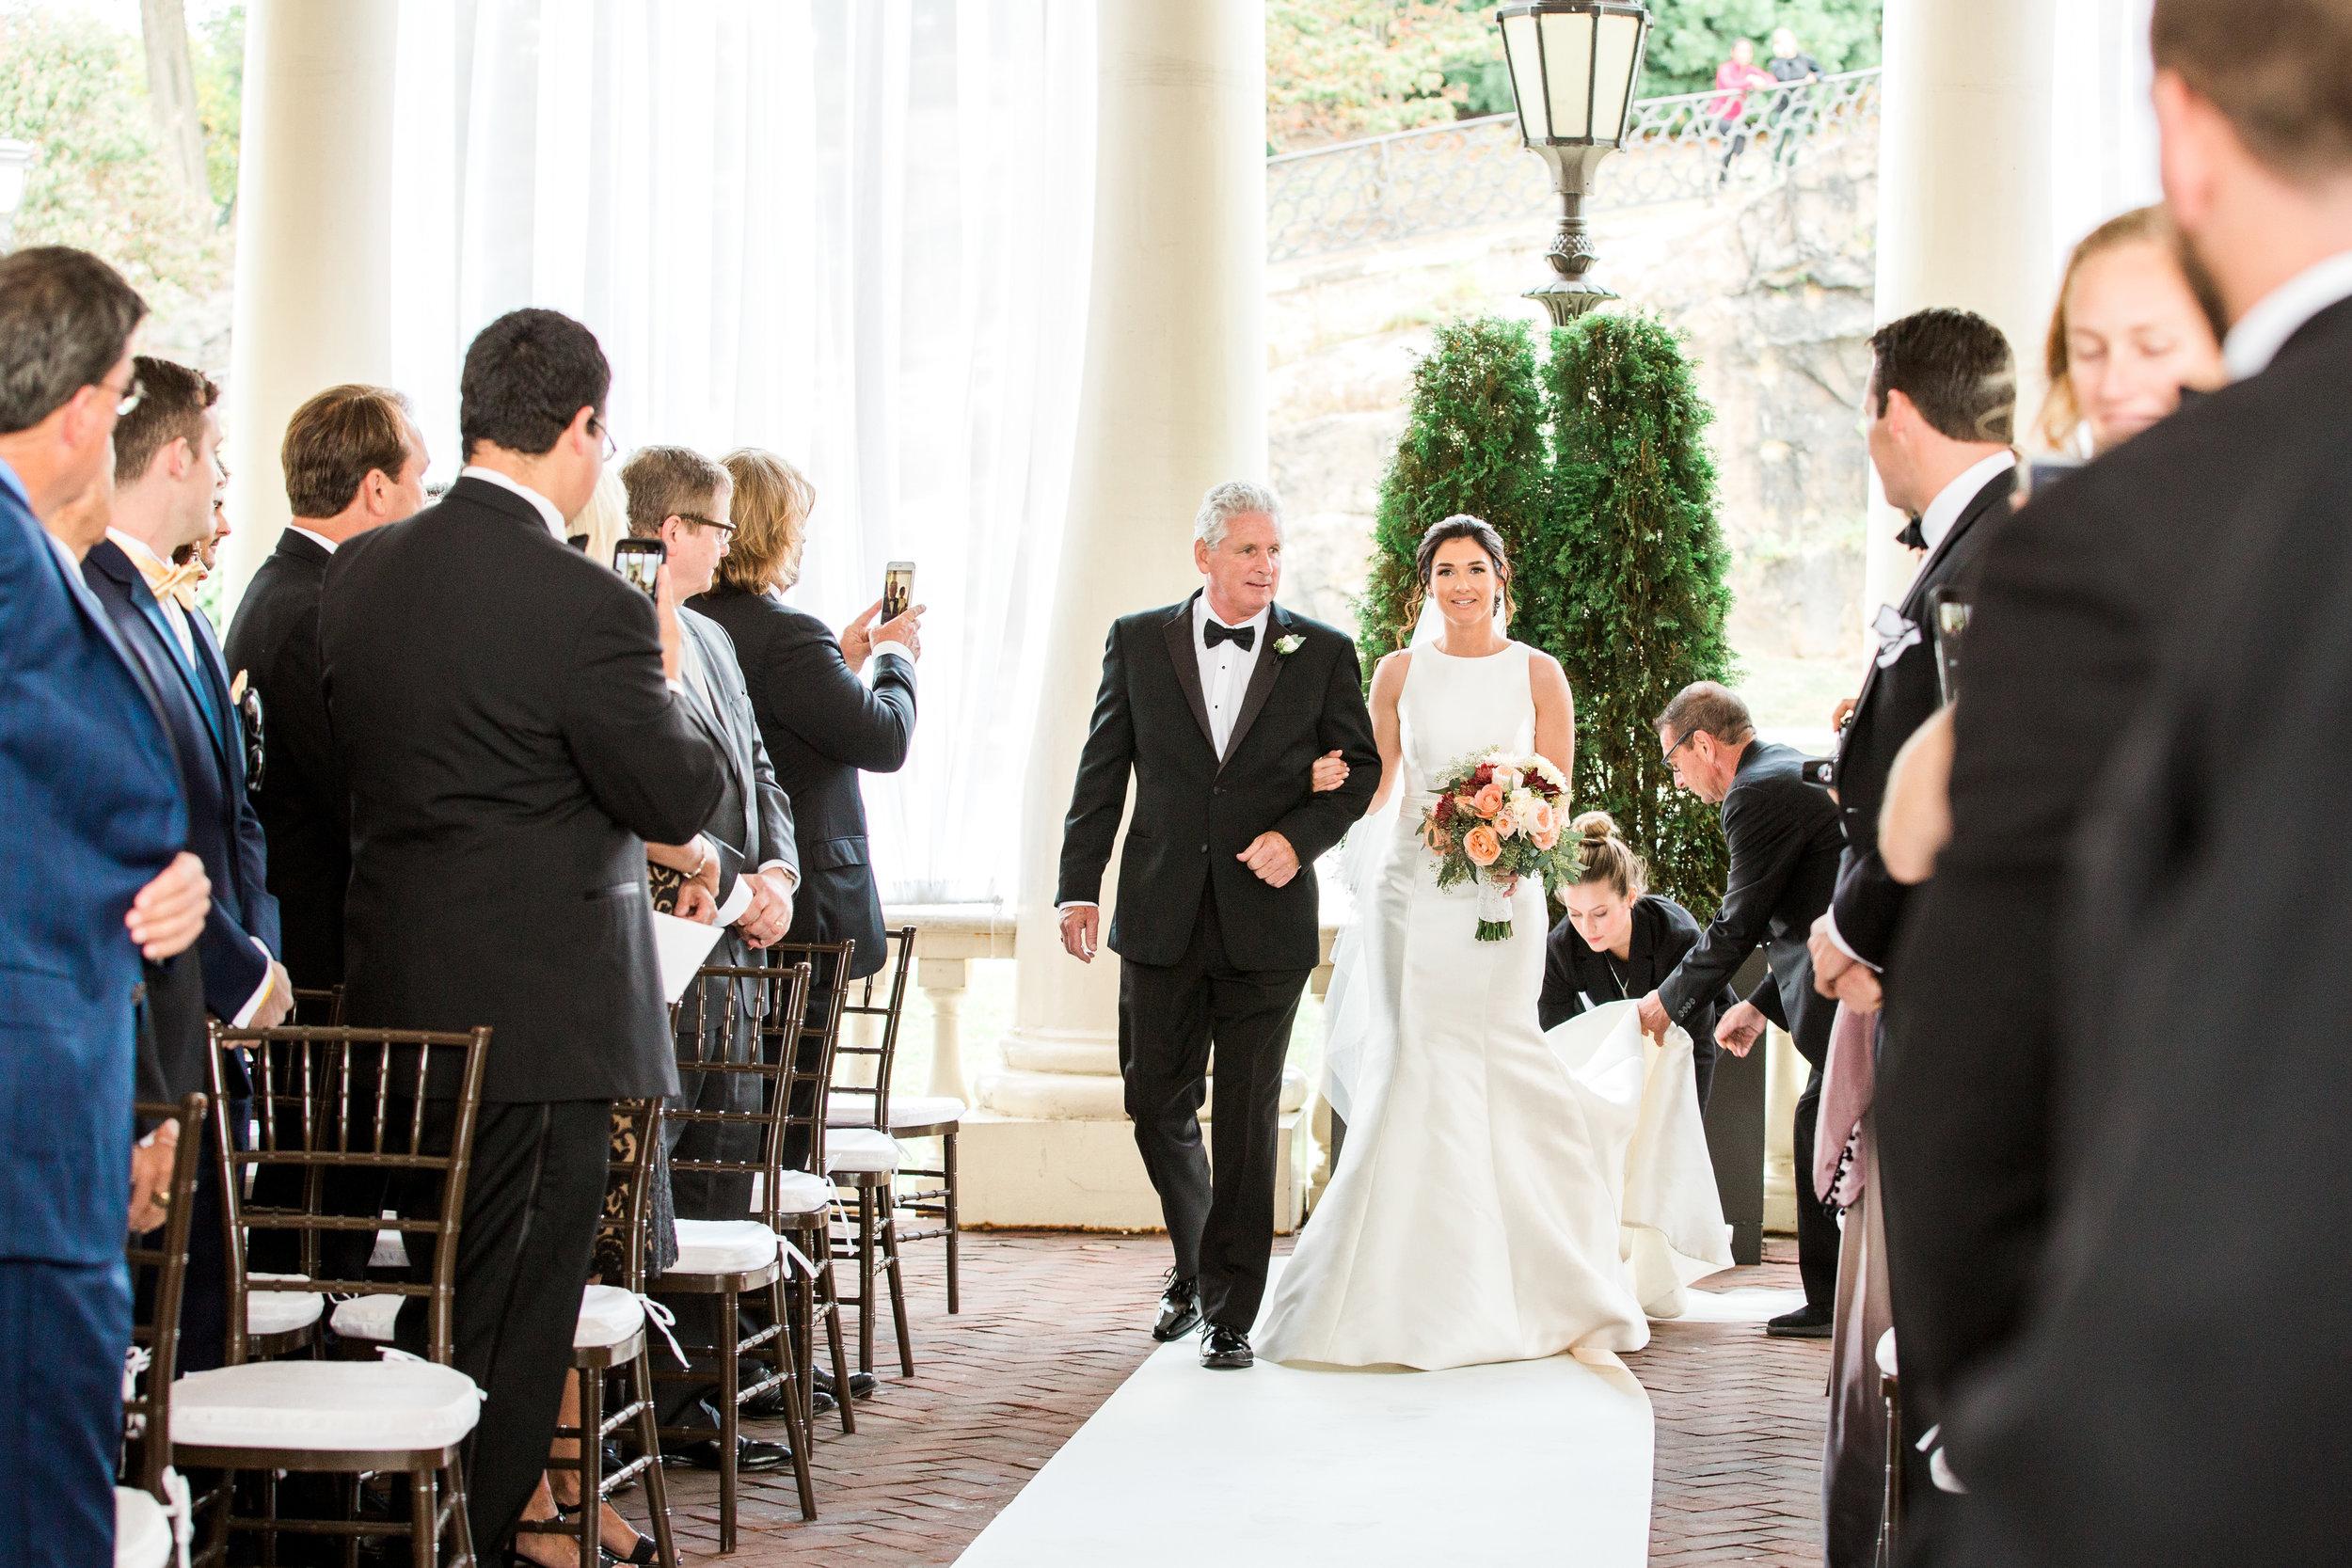 Hudson-Nichols-Black-Tie-Bride-Philadelphia-Waterworks-Wedding-Cescaphe-Ceremony03.jpg